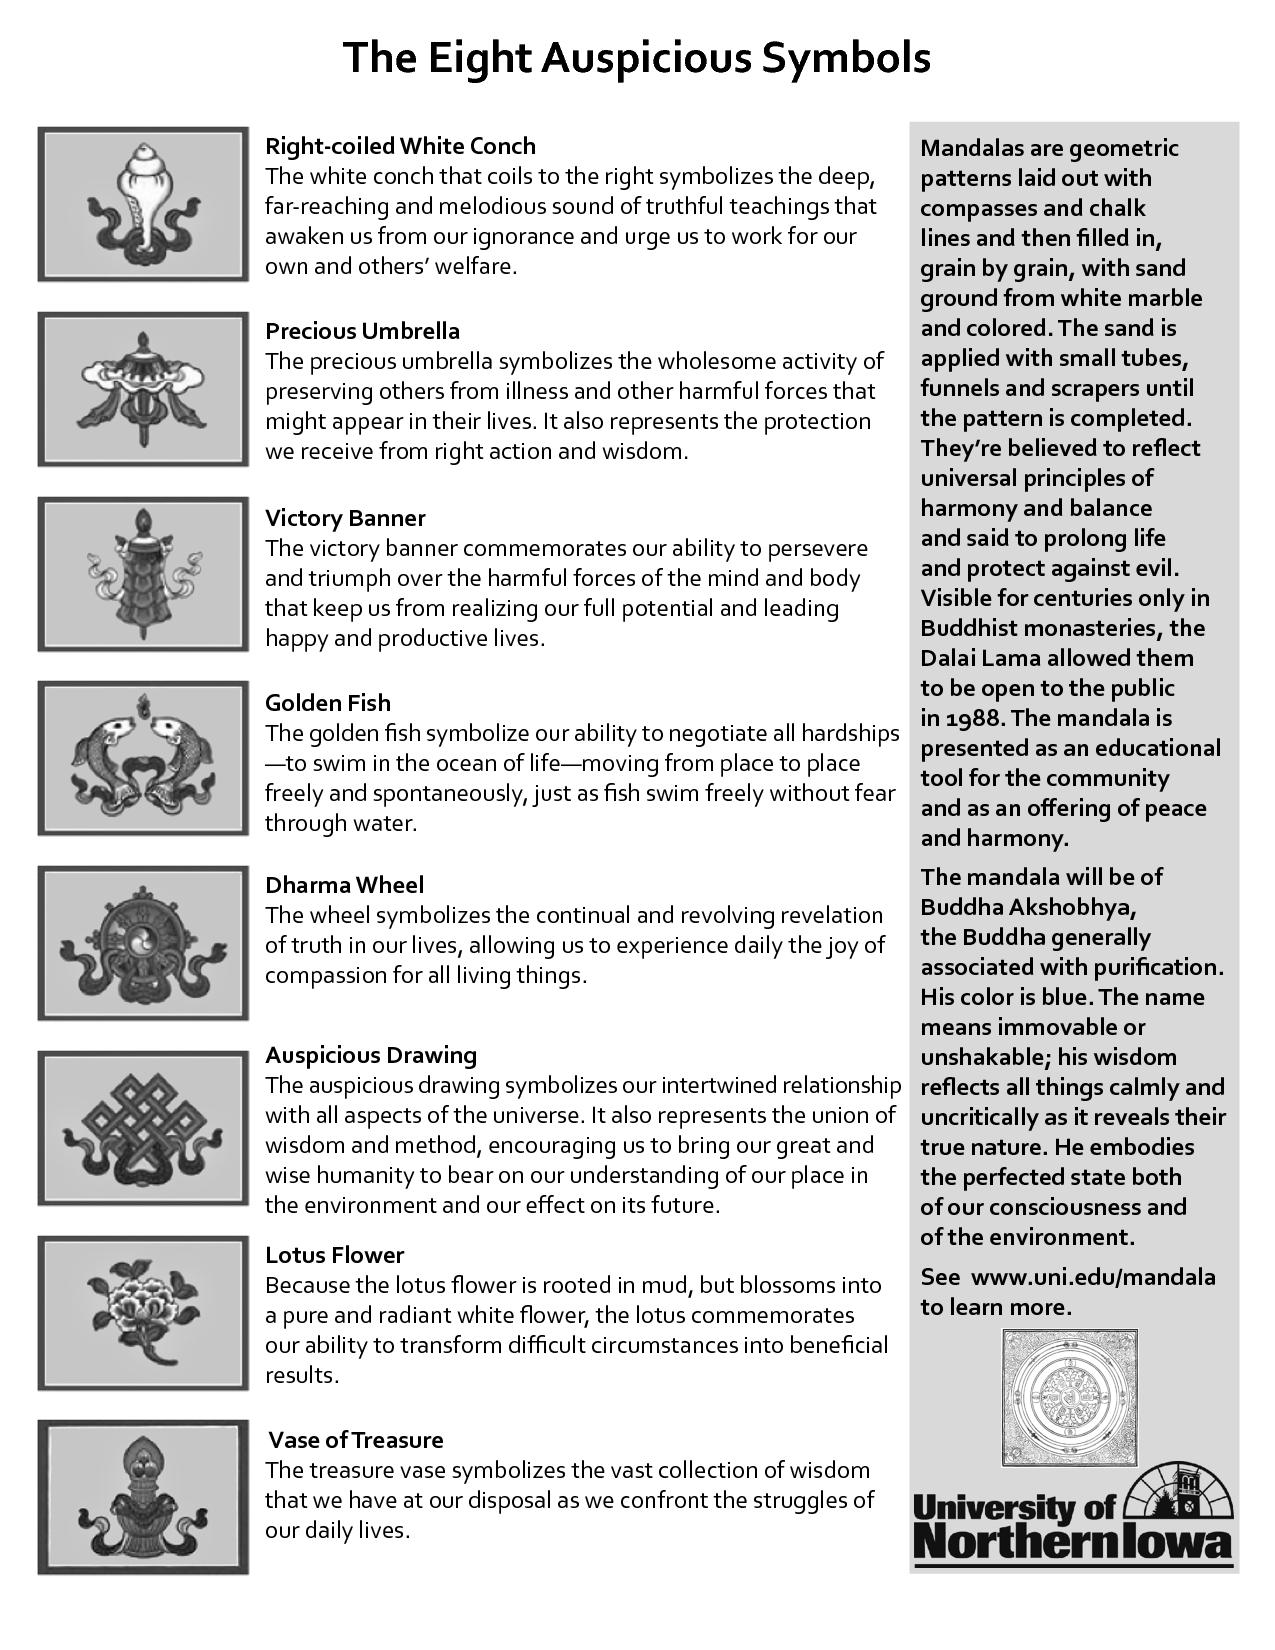 The 8 Auspicious Buddhist Symbols Buddhism In 2018 Pinterest